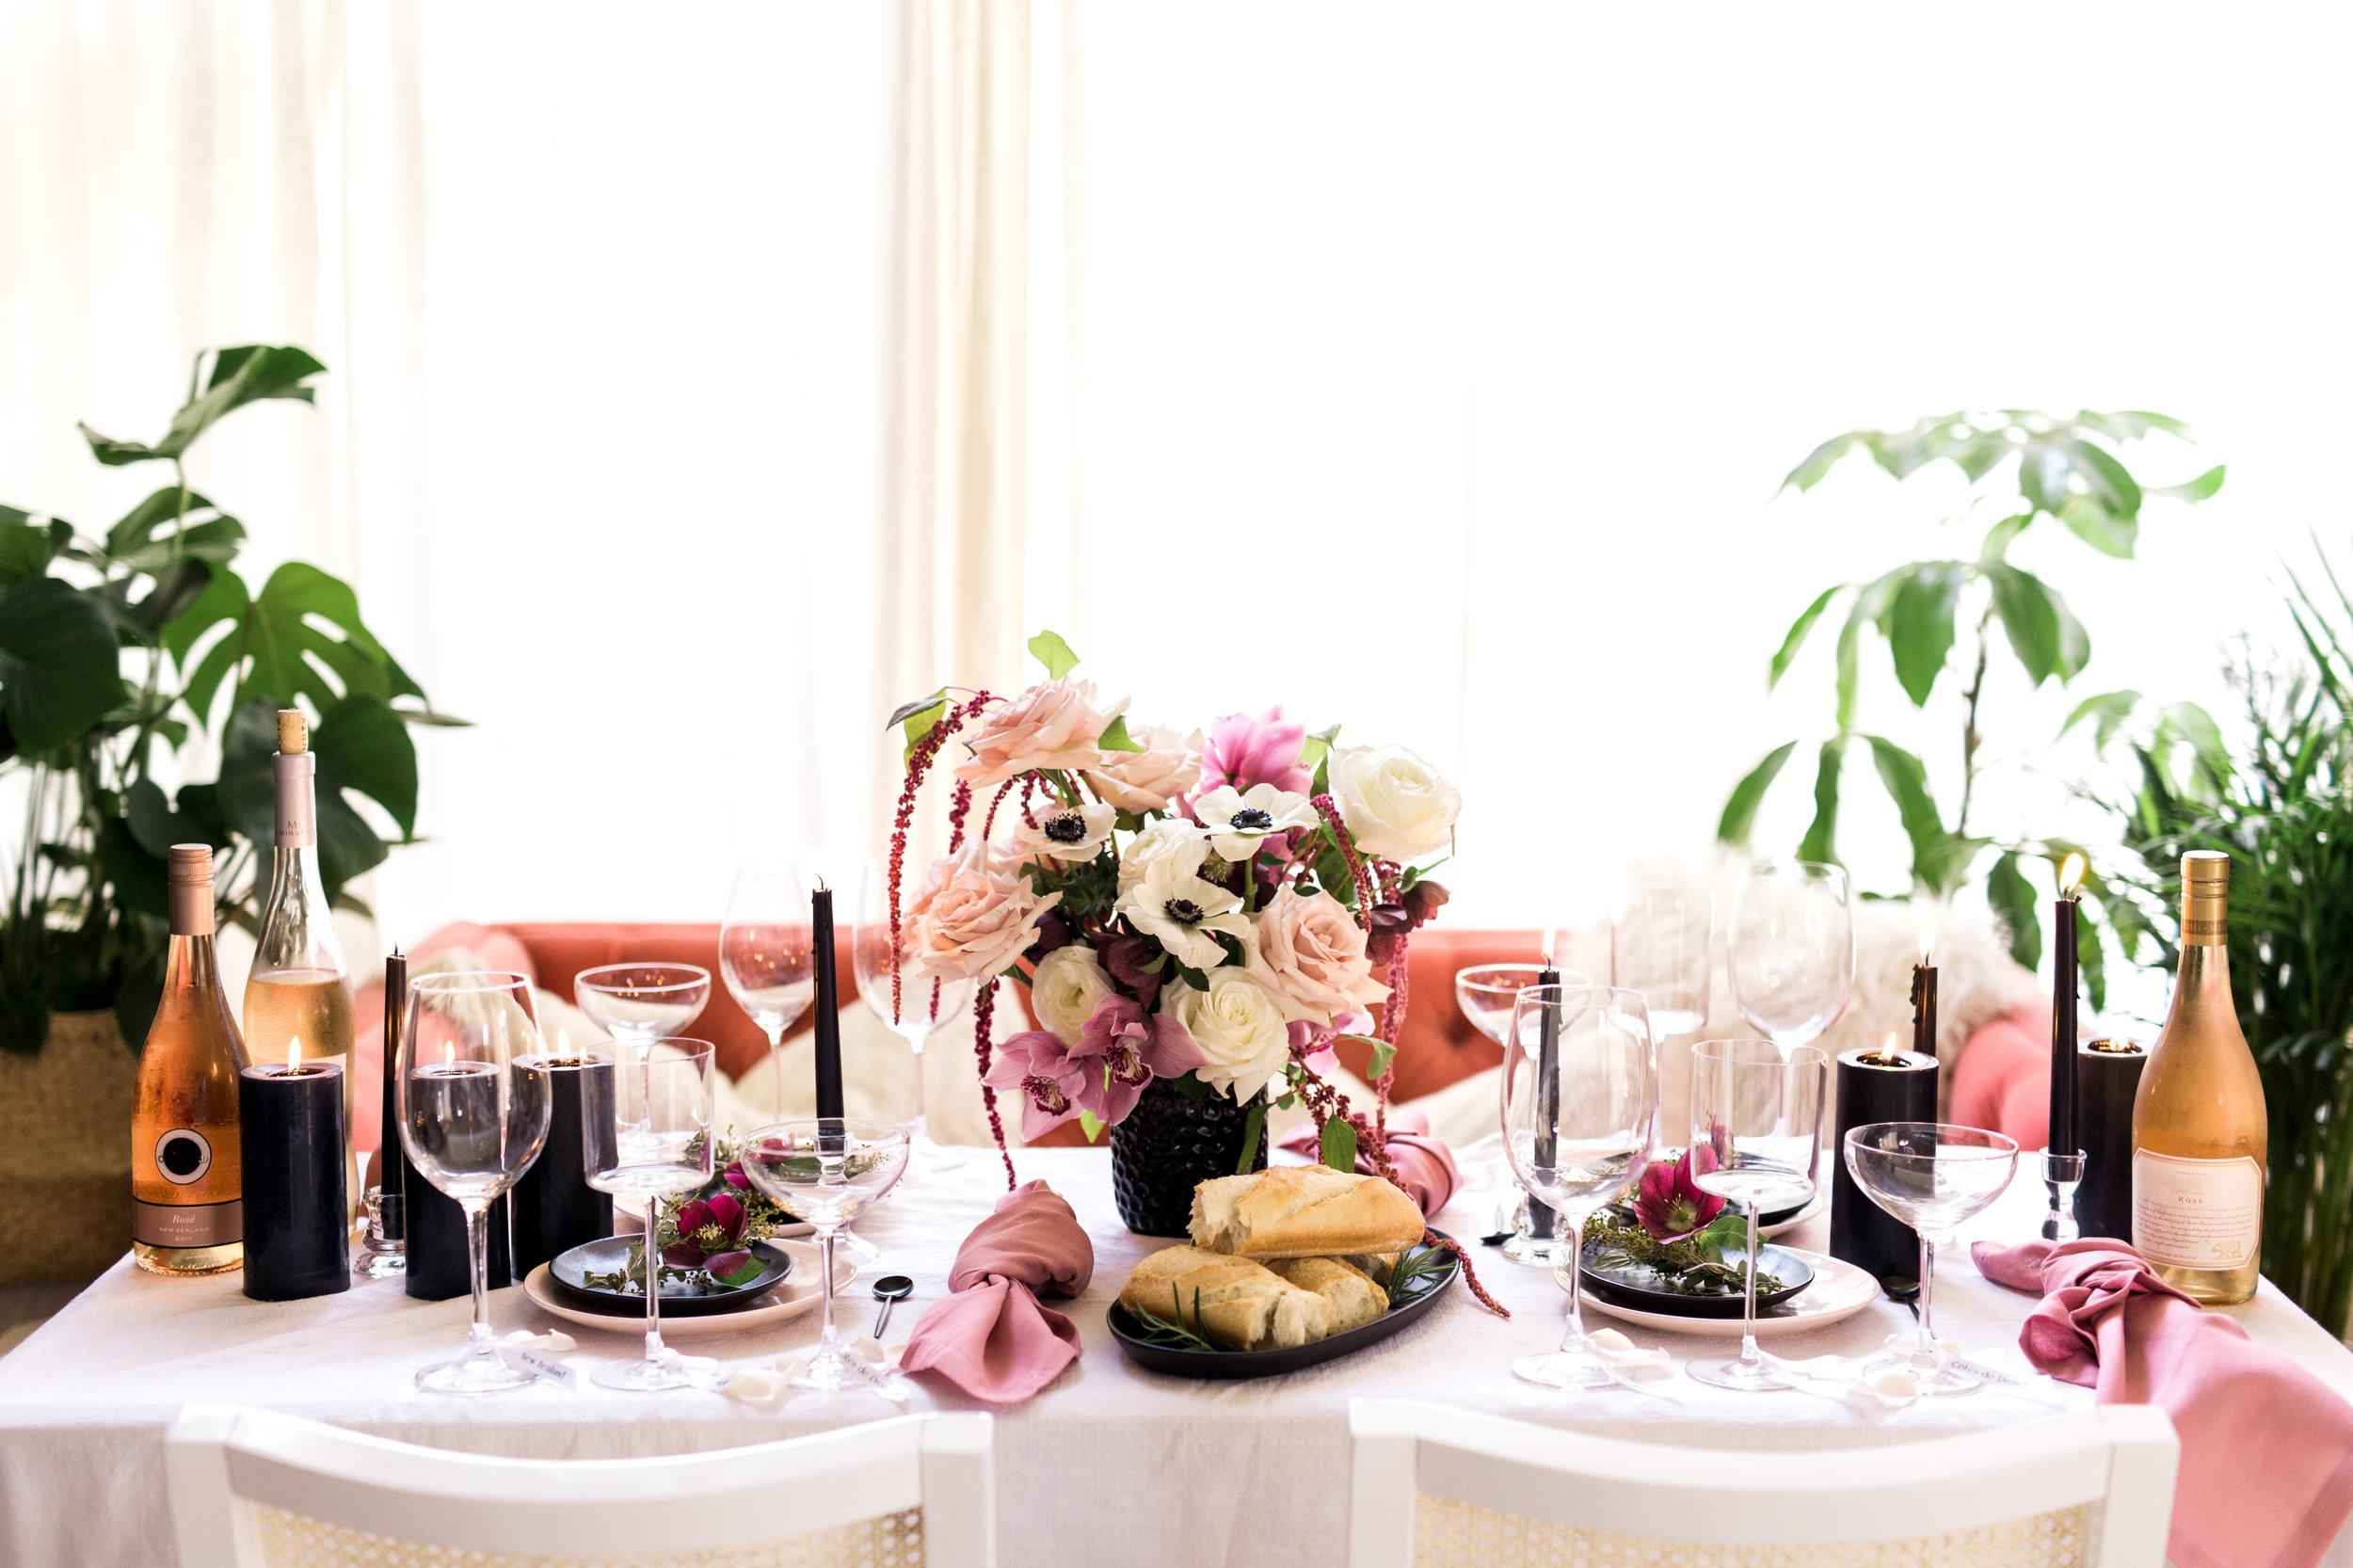 Host a wine tasting | A Fabulous Fete